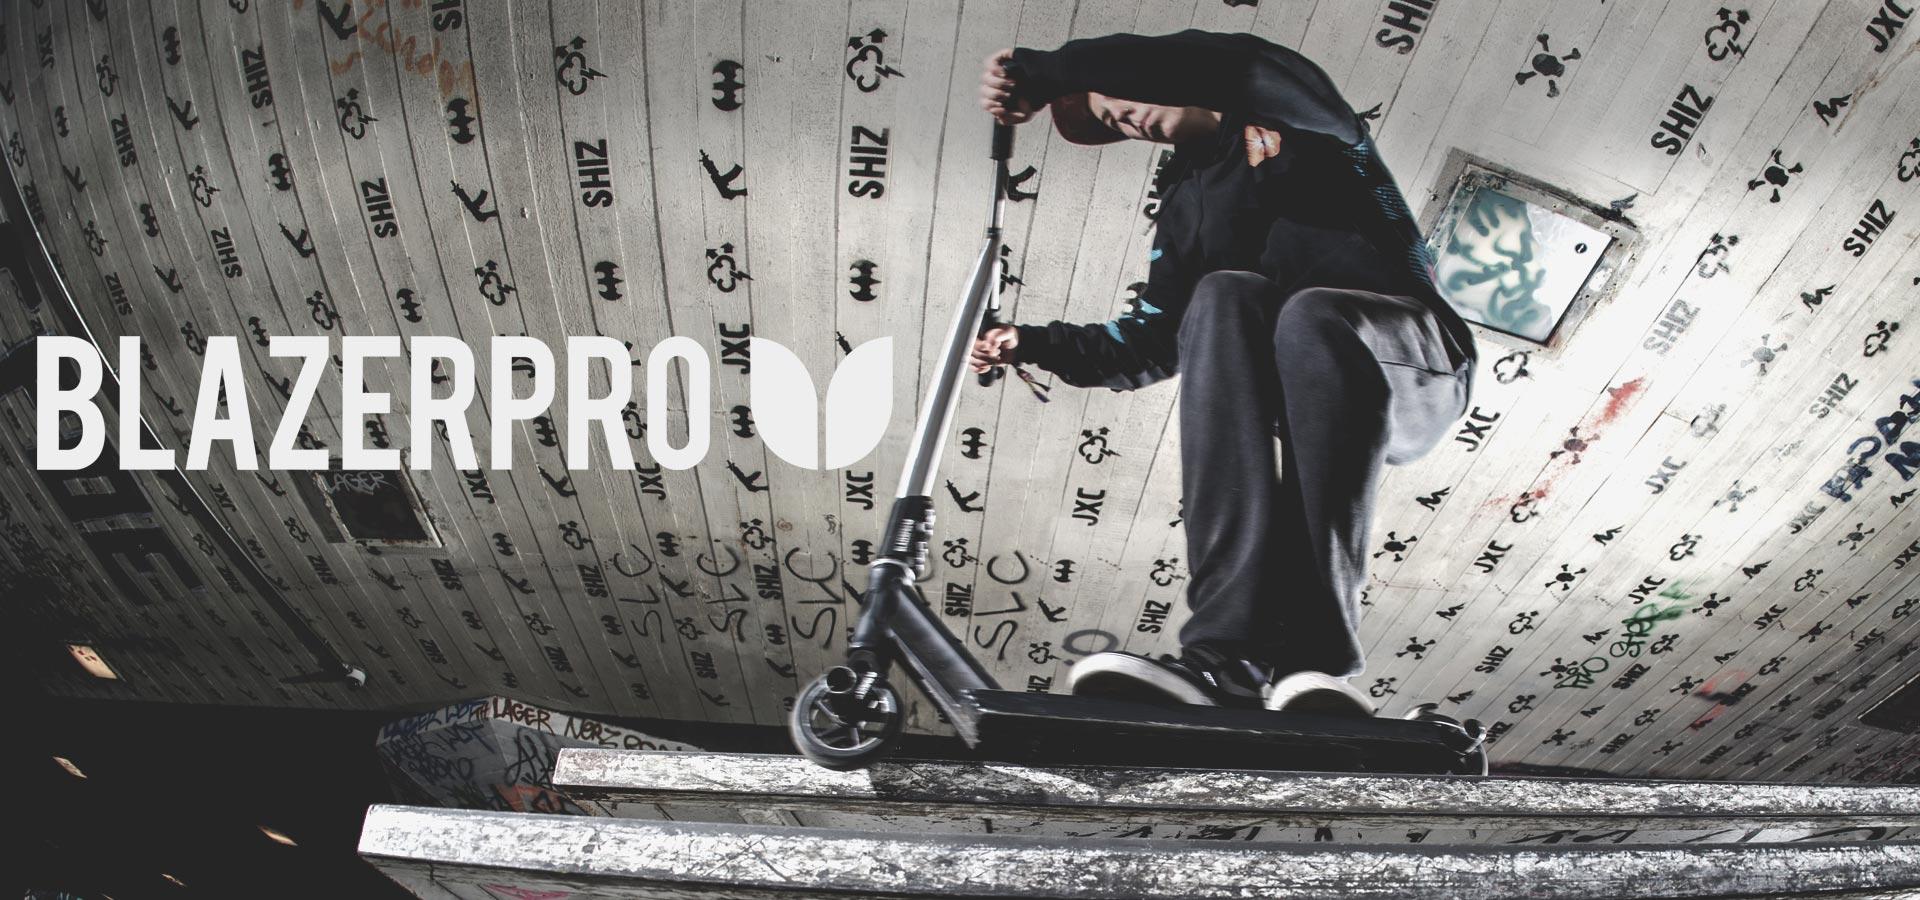 Blazer-Pro-LDN-2016-homepage-2